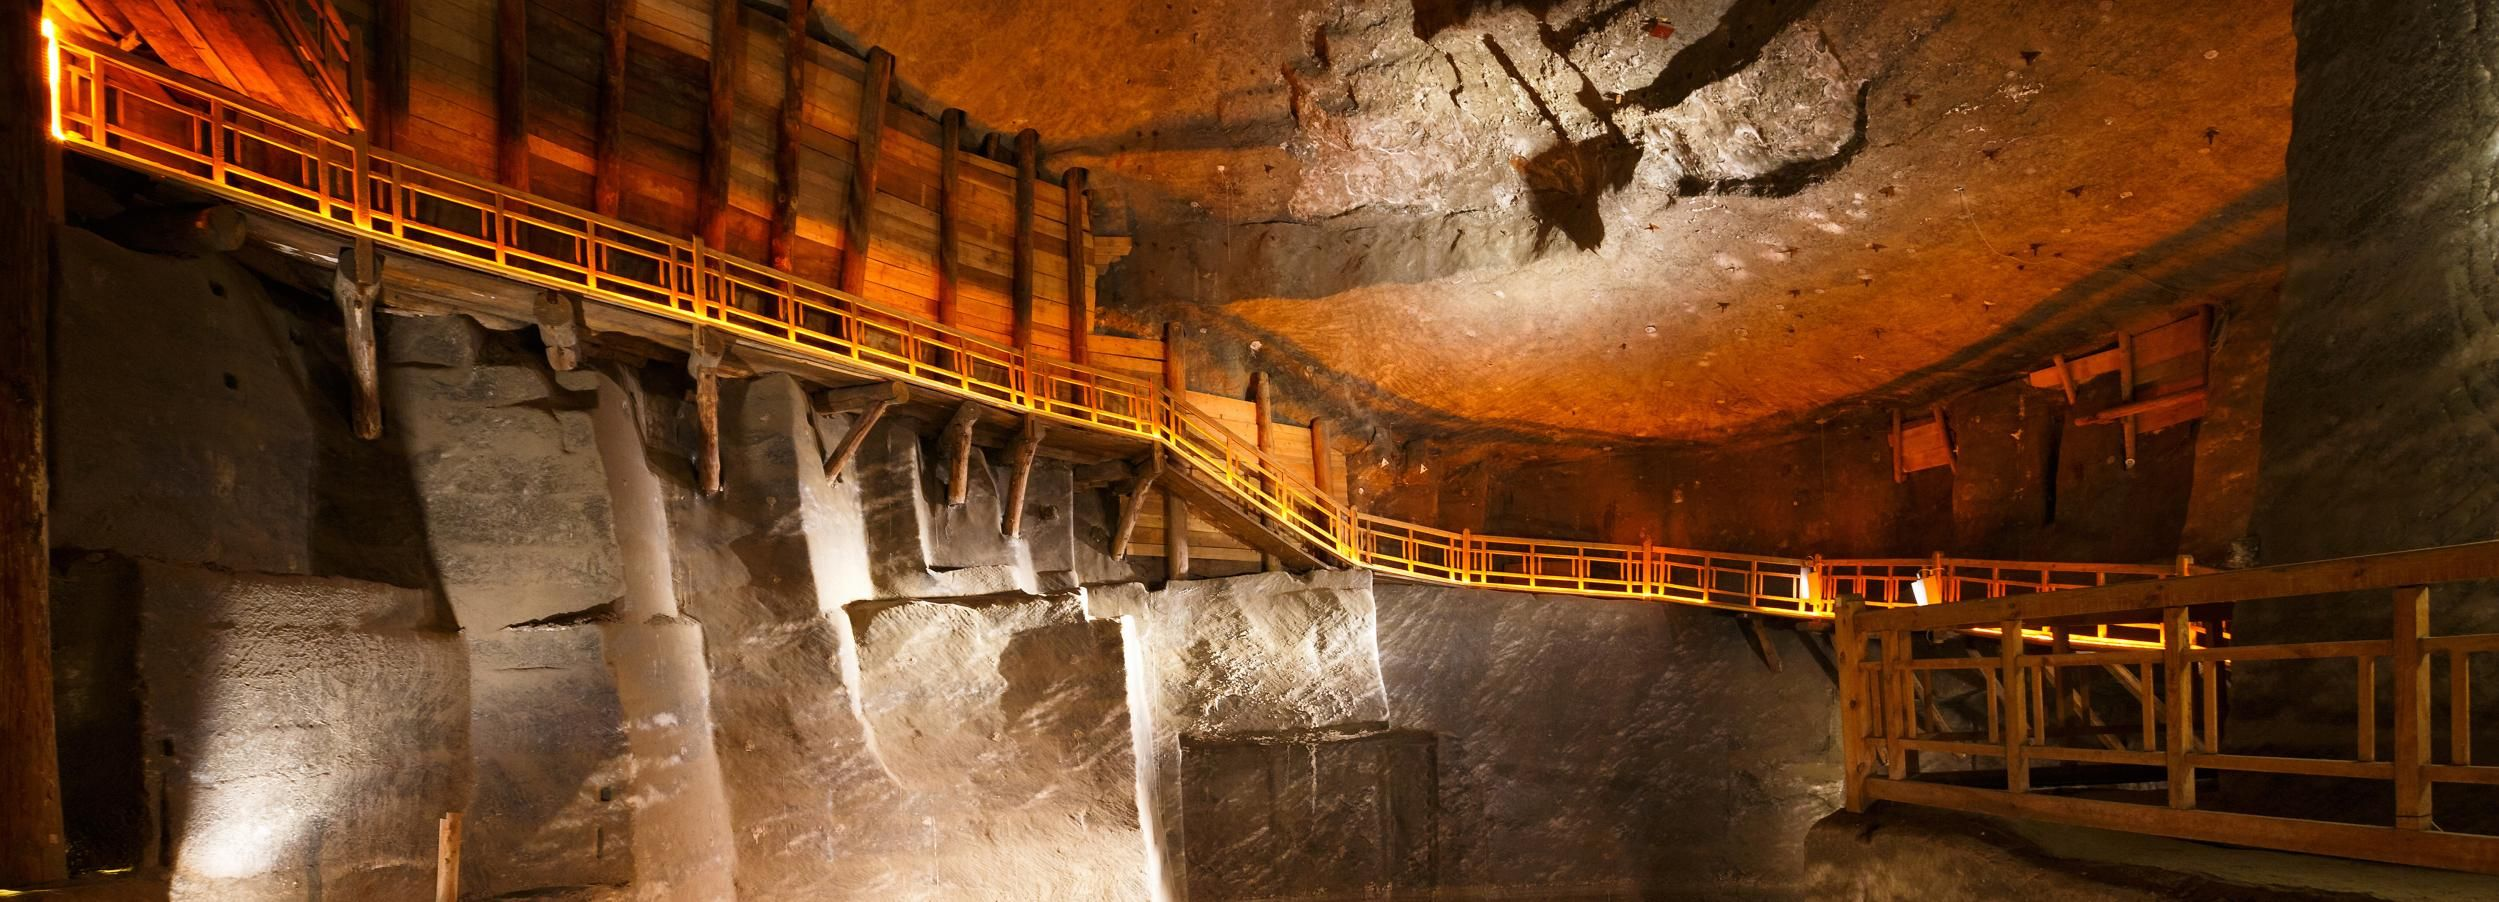 Da Varsavia: tour di Cracovia e Miniera di sale di Wieliczka